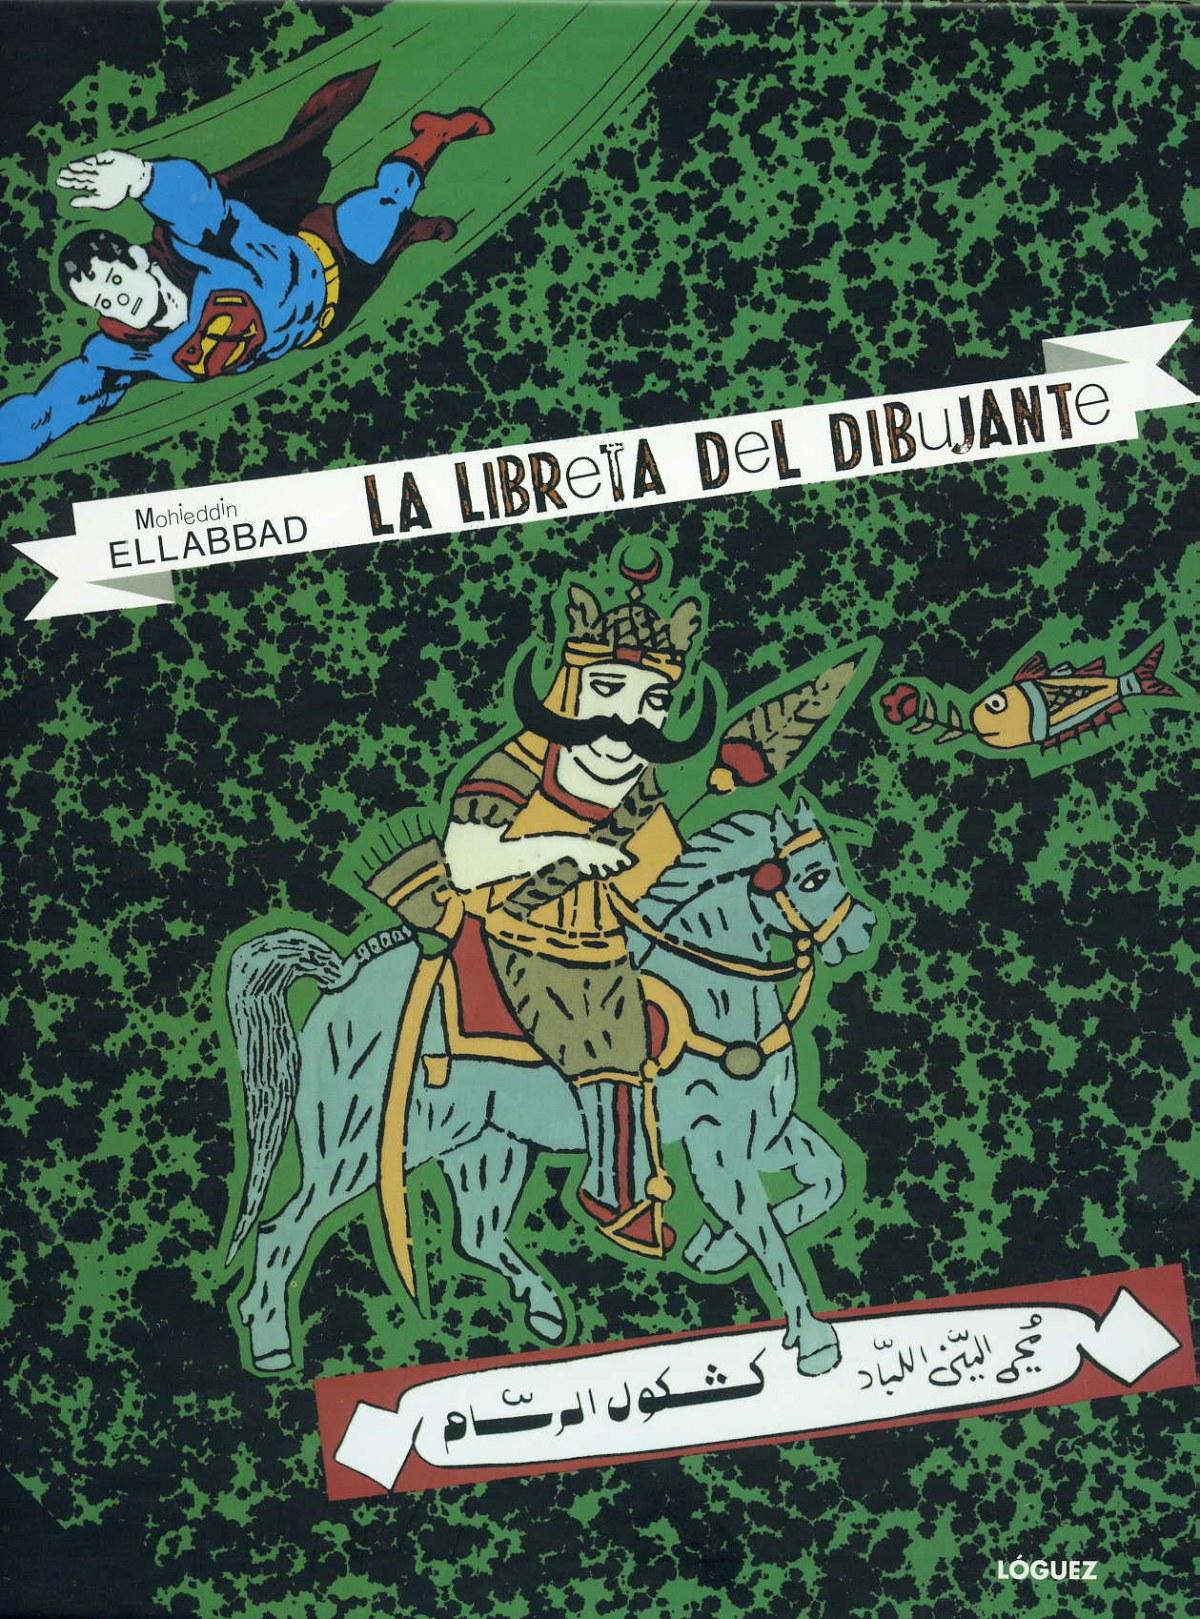 Libreta Del Dibujante (Cartone) - Ellabbad, Mohieddin